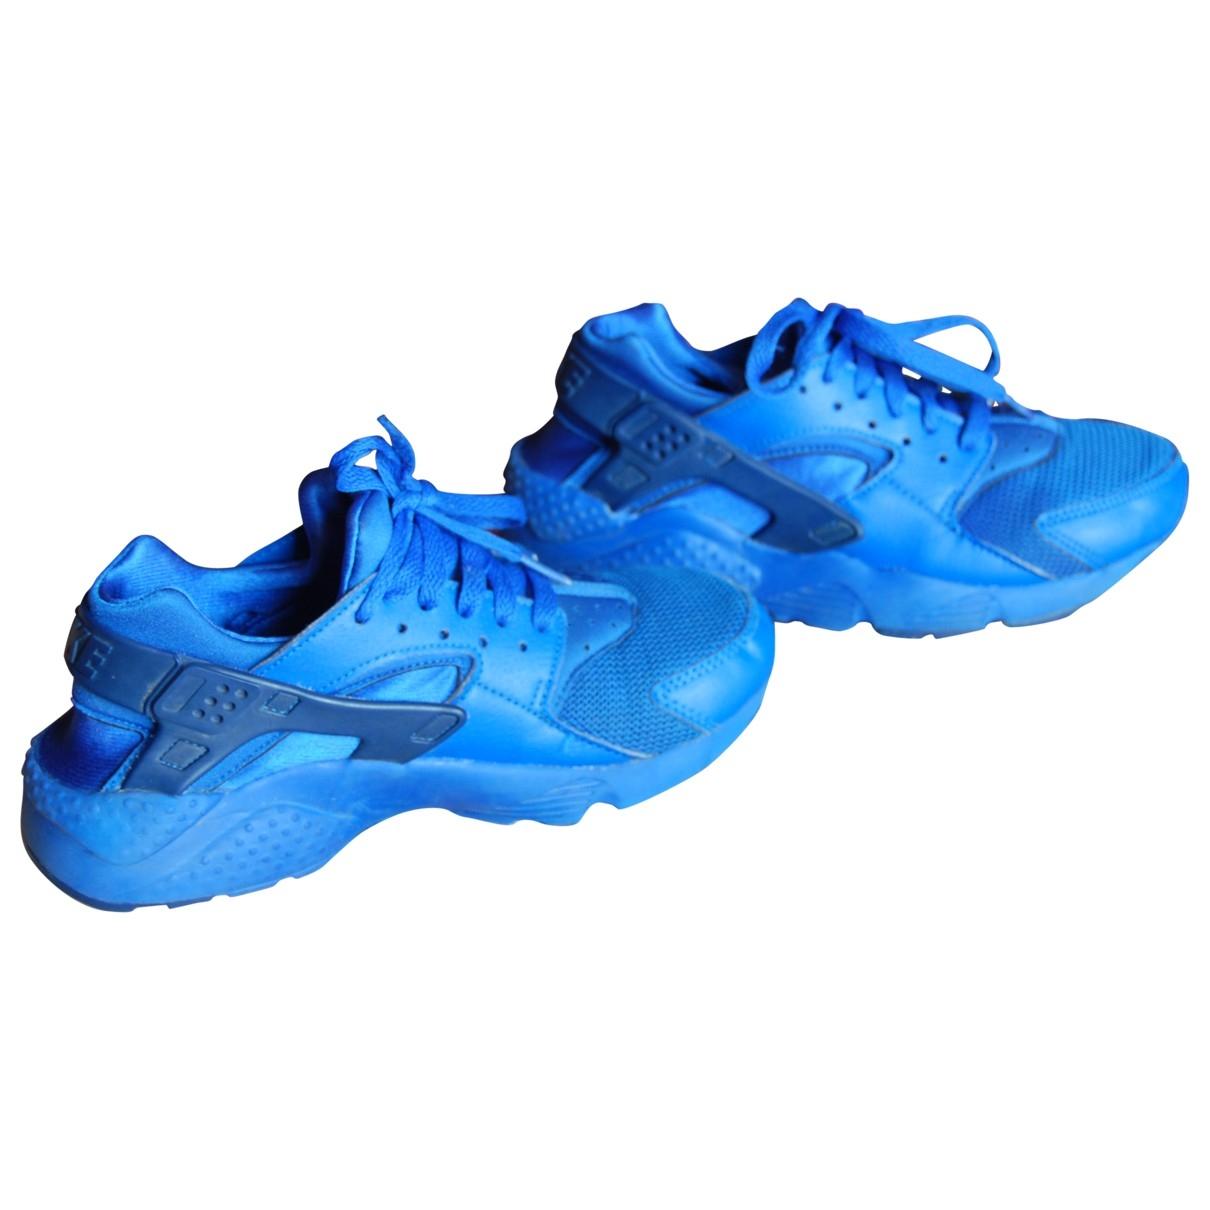 Nike Huarache Blue Leather Trainers for Women 35.5 EU